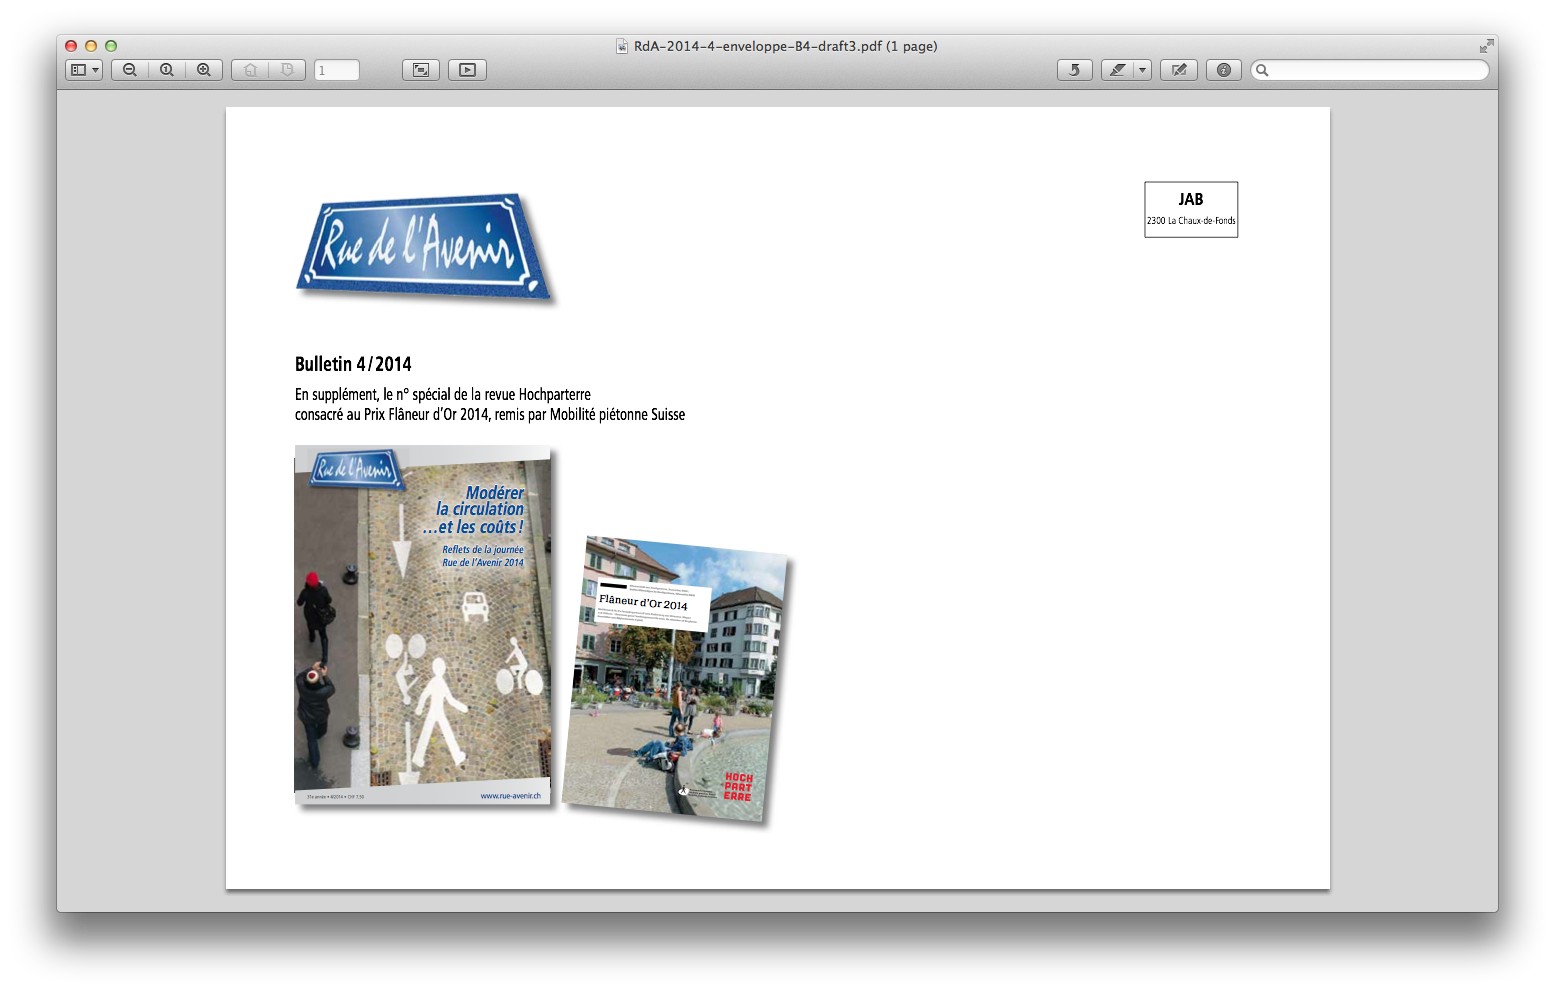 Bulletin Rue de l'Avenir - enveloppe